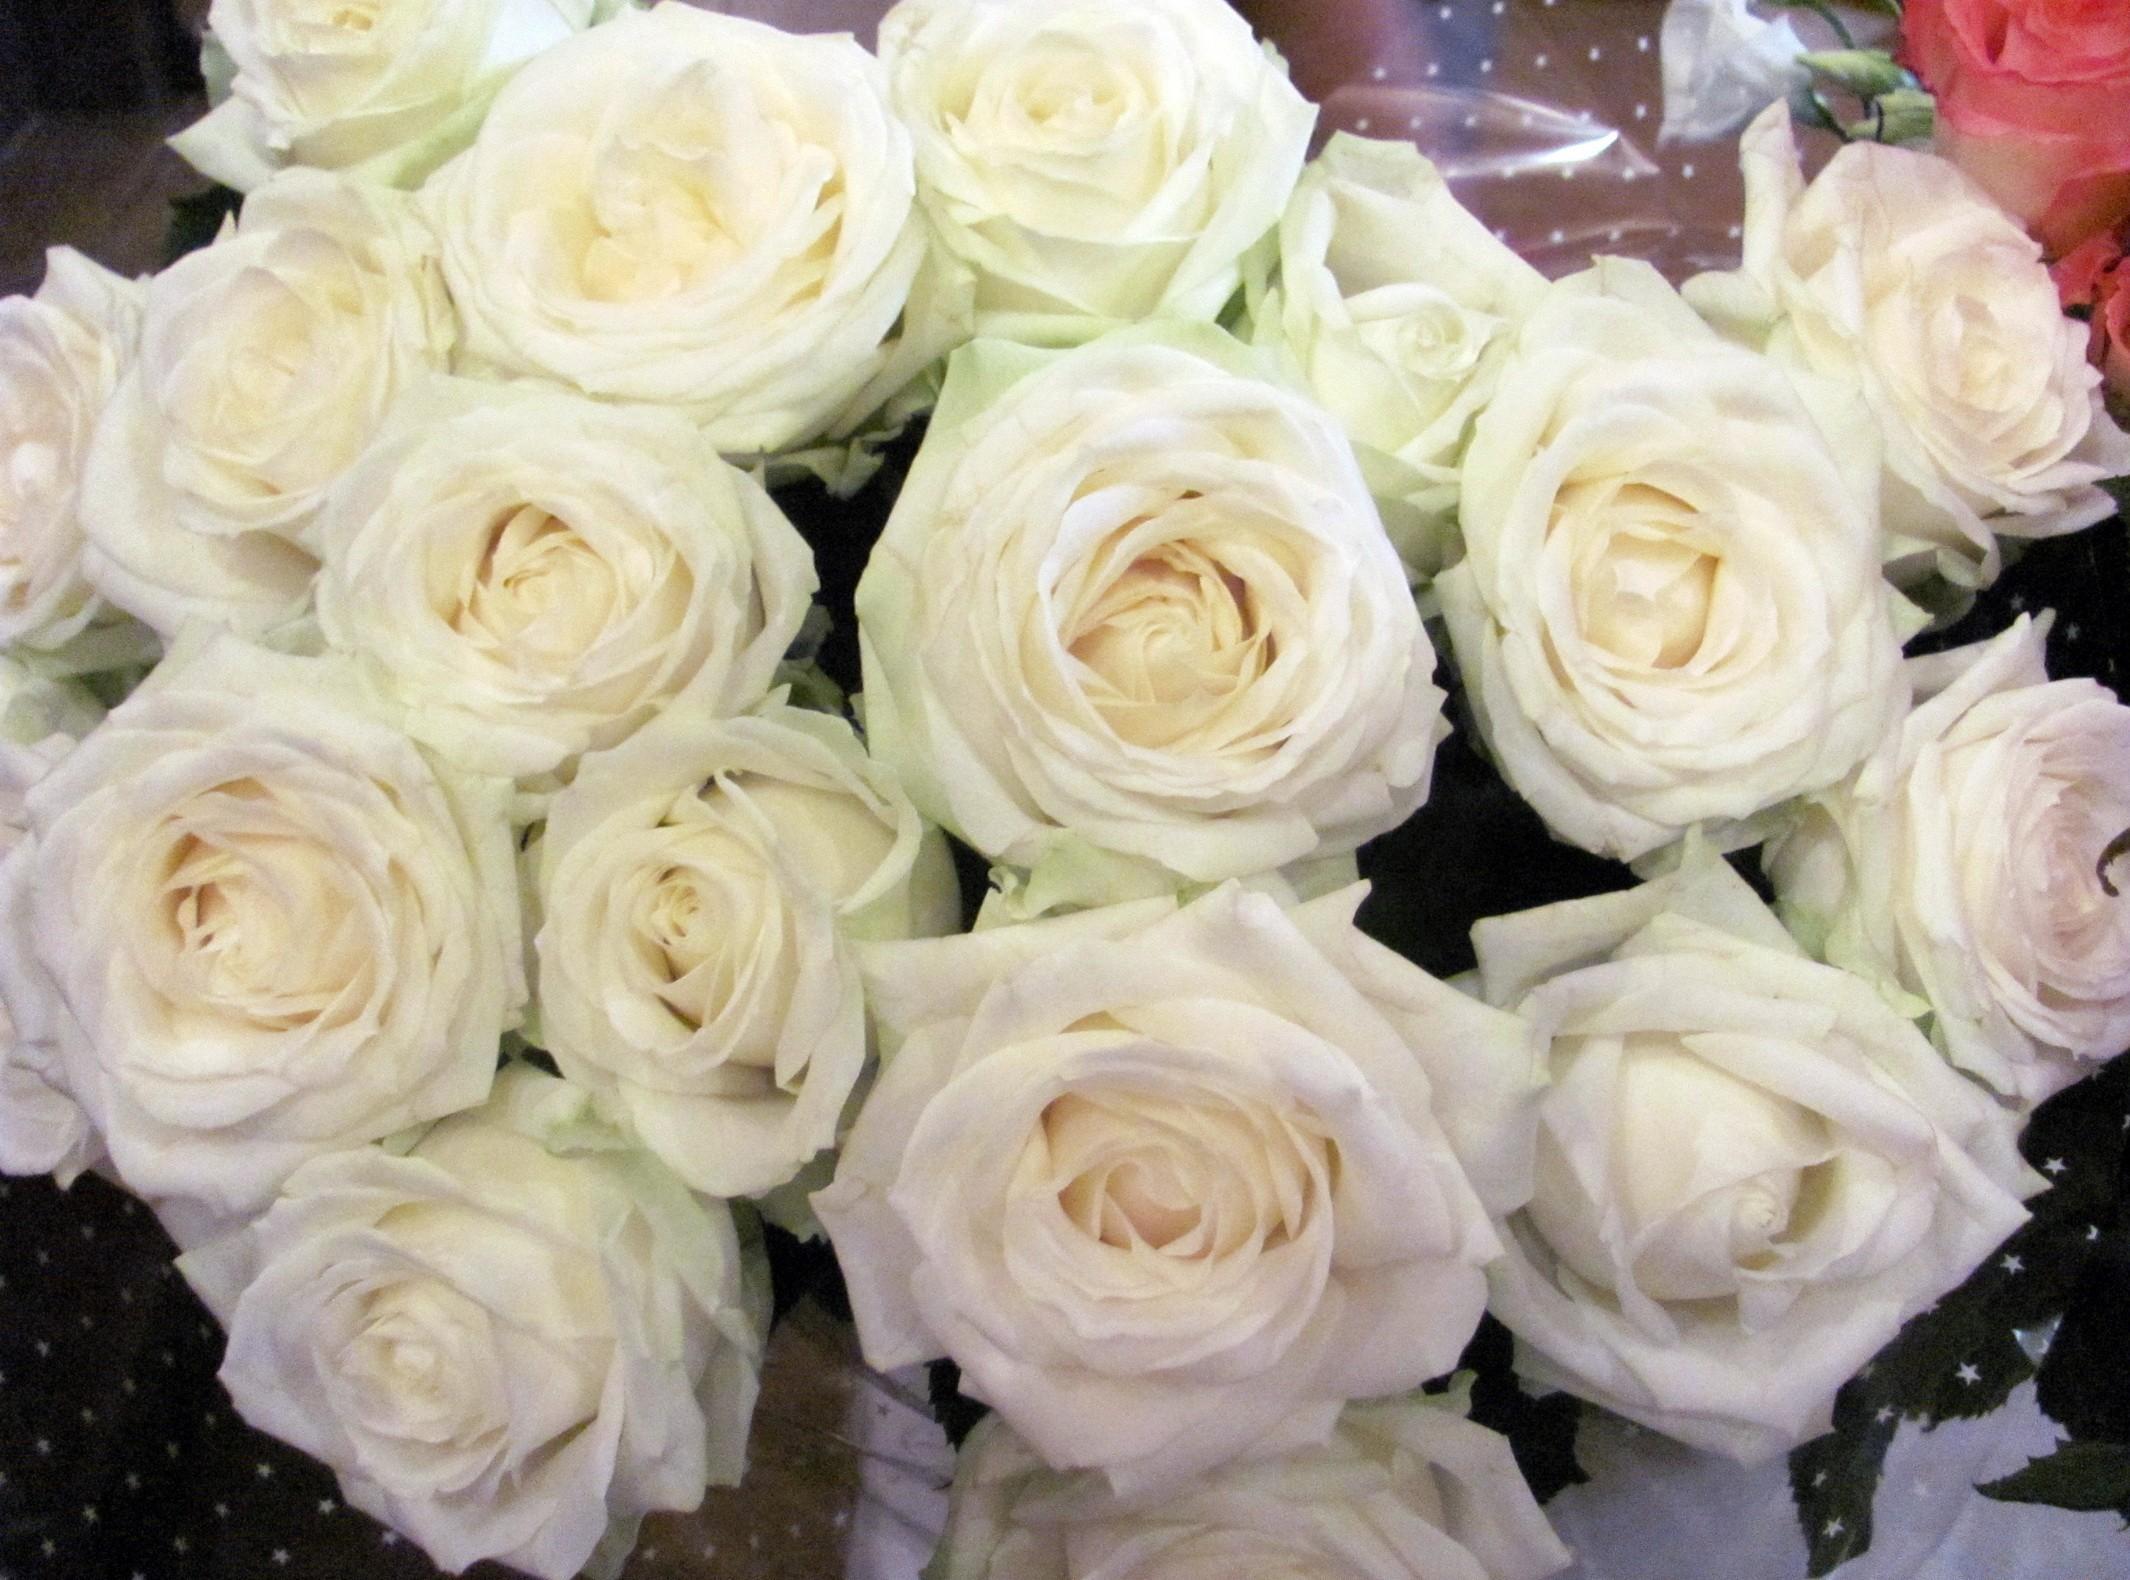 mawar bunga bunga putih bunga pengemasan